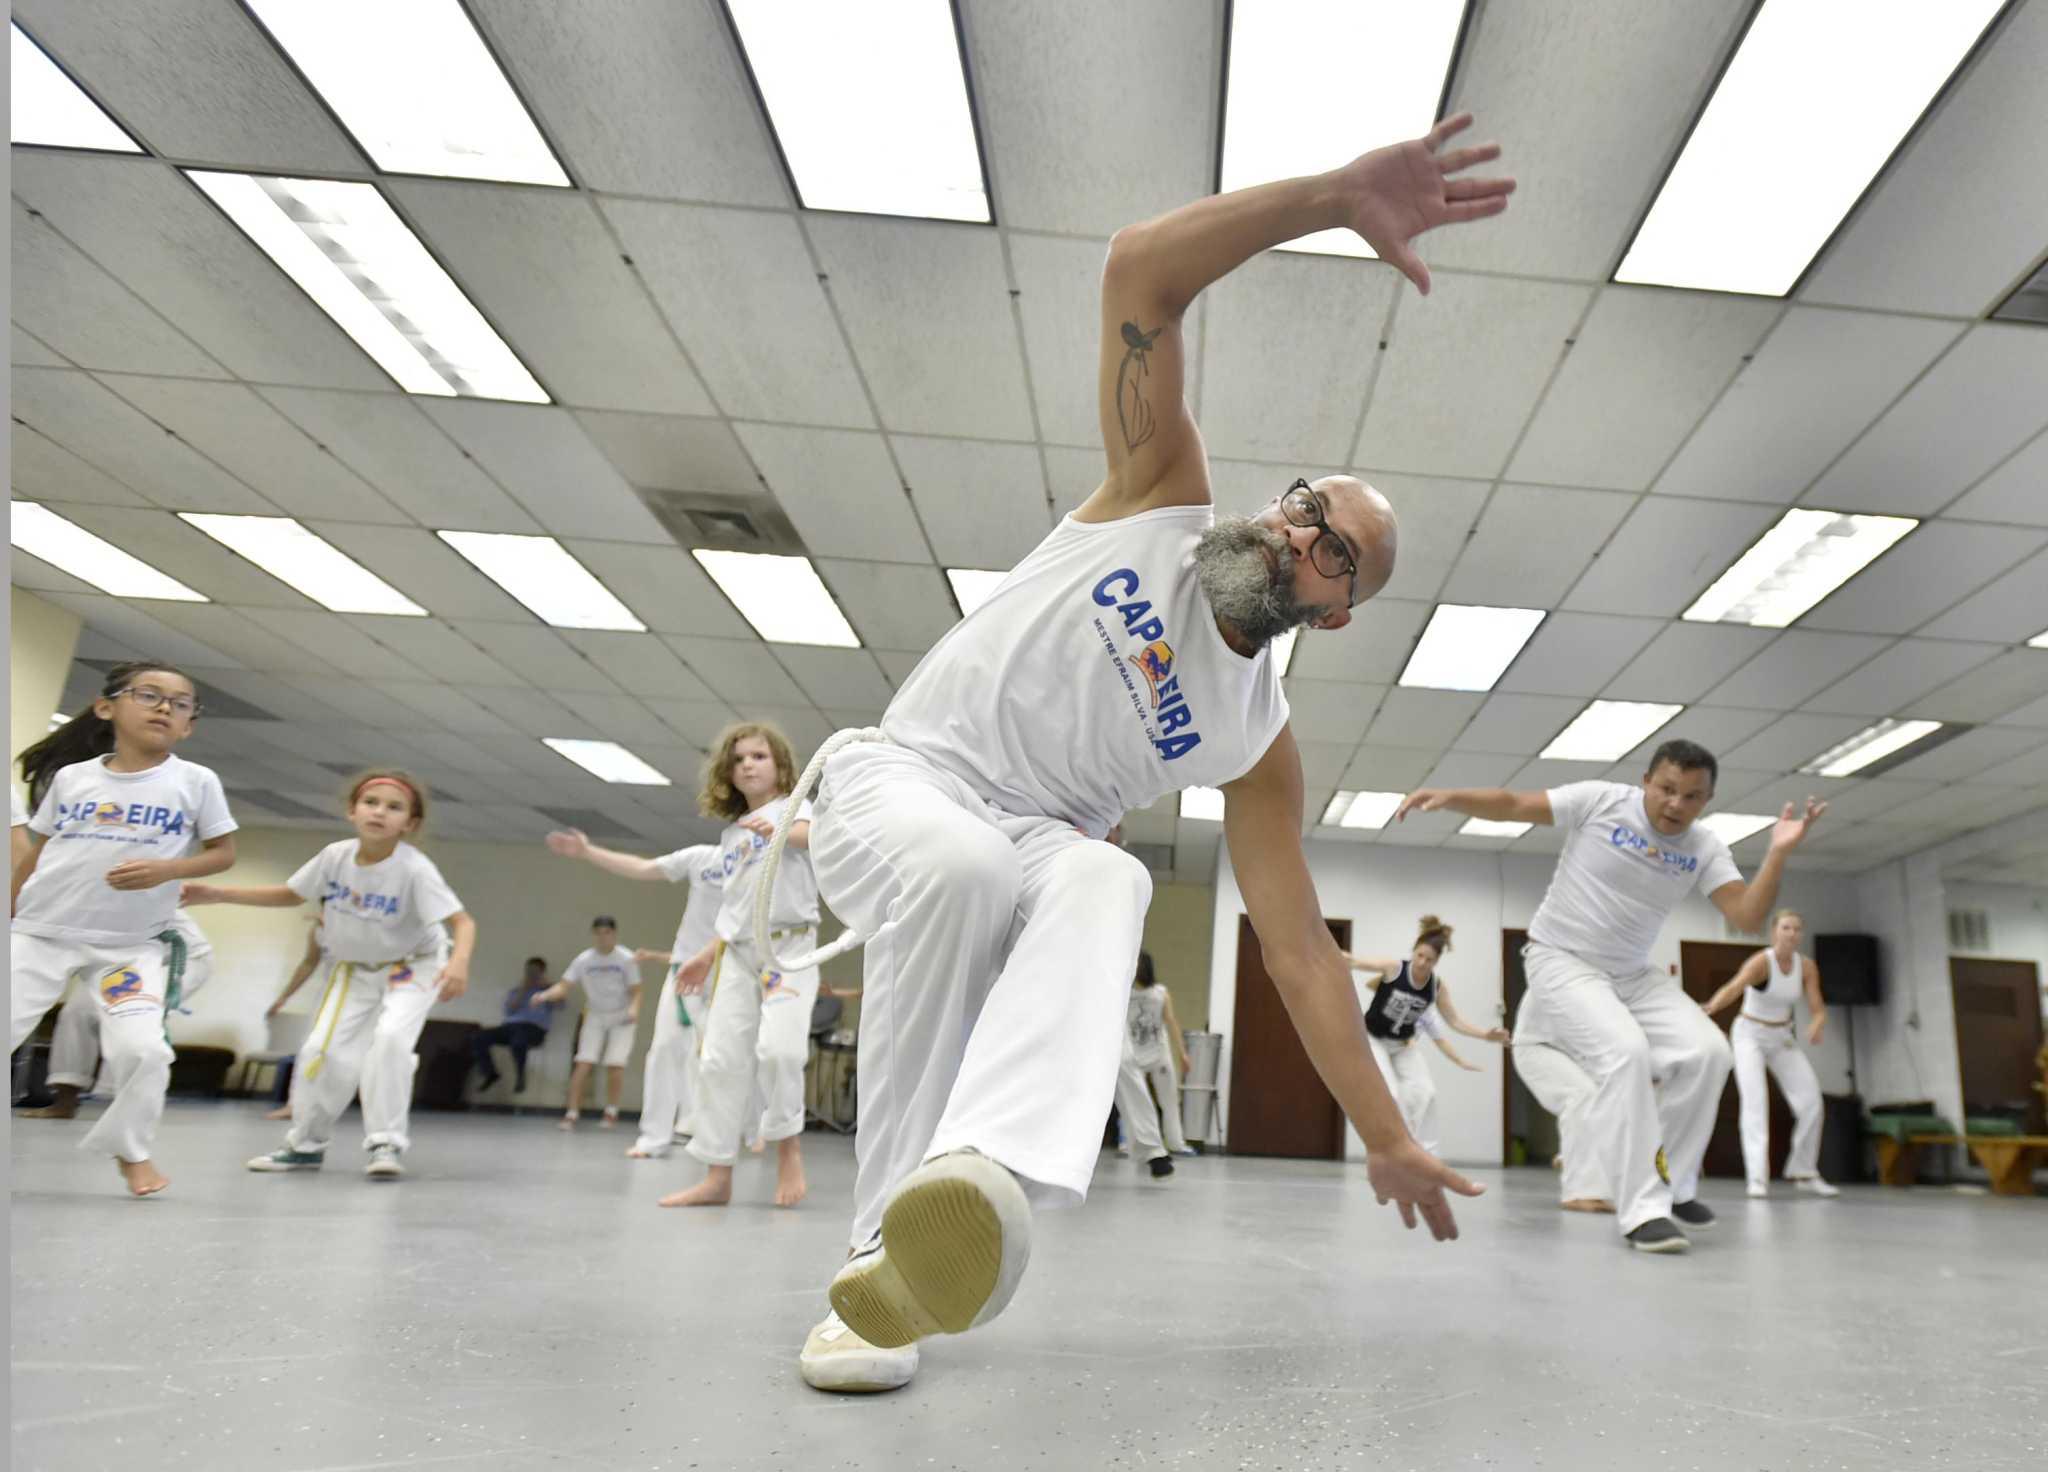 West Haven capoeira expert opens Brazilian Fitness Center in New Haven